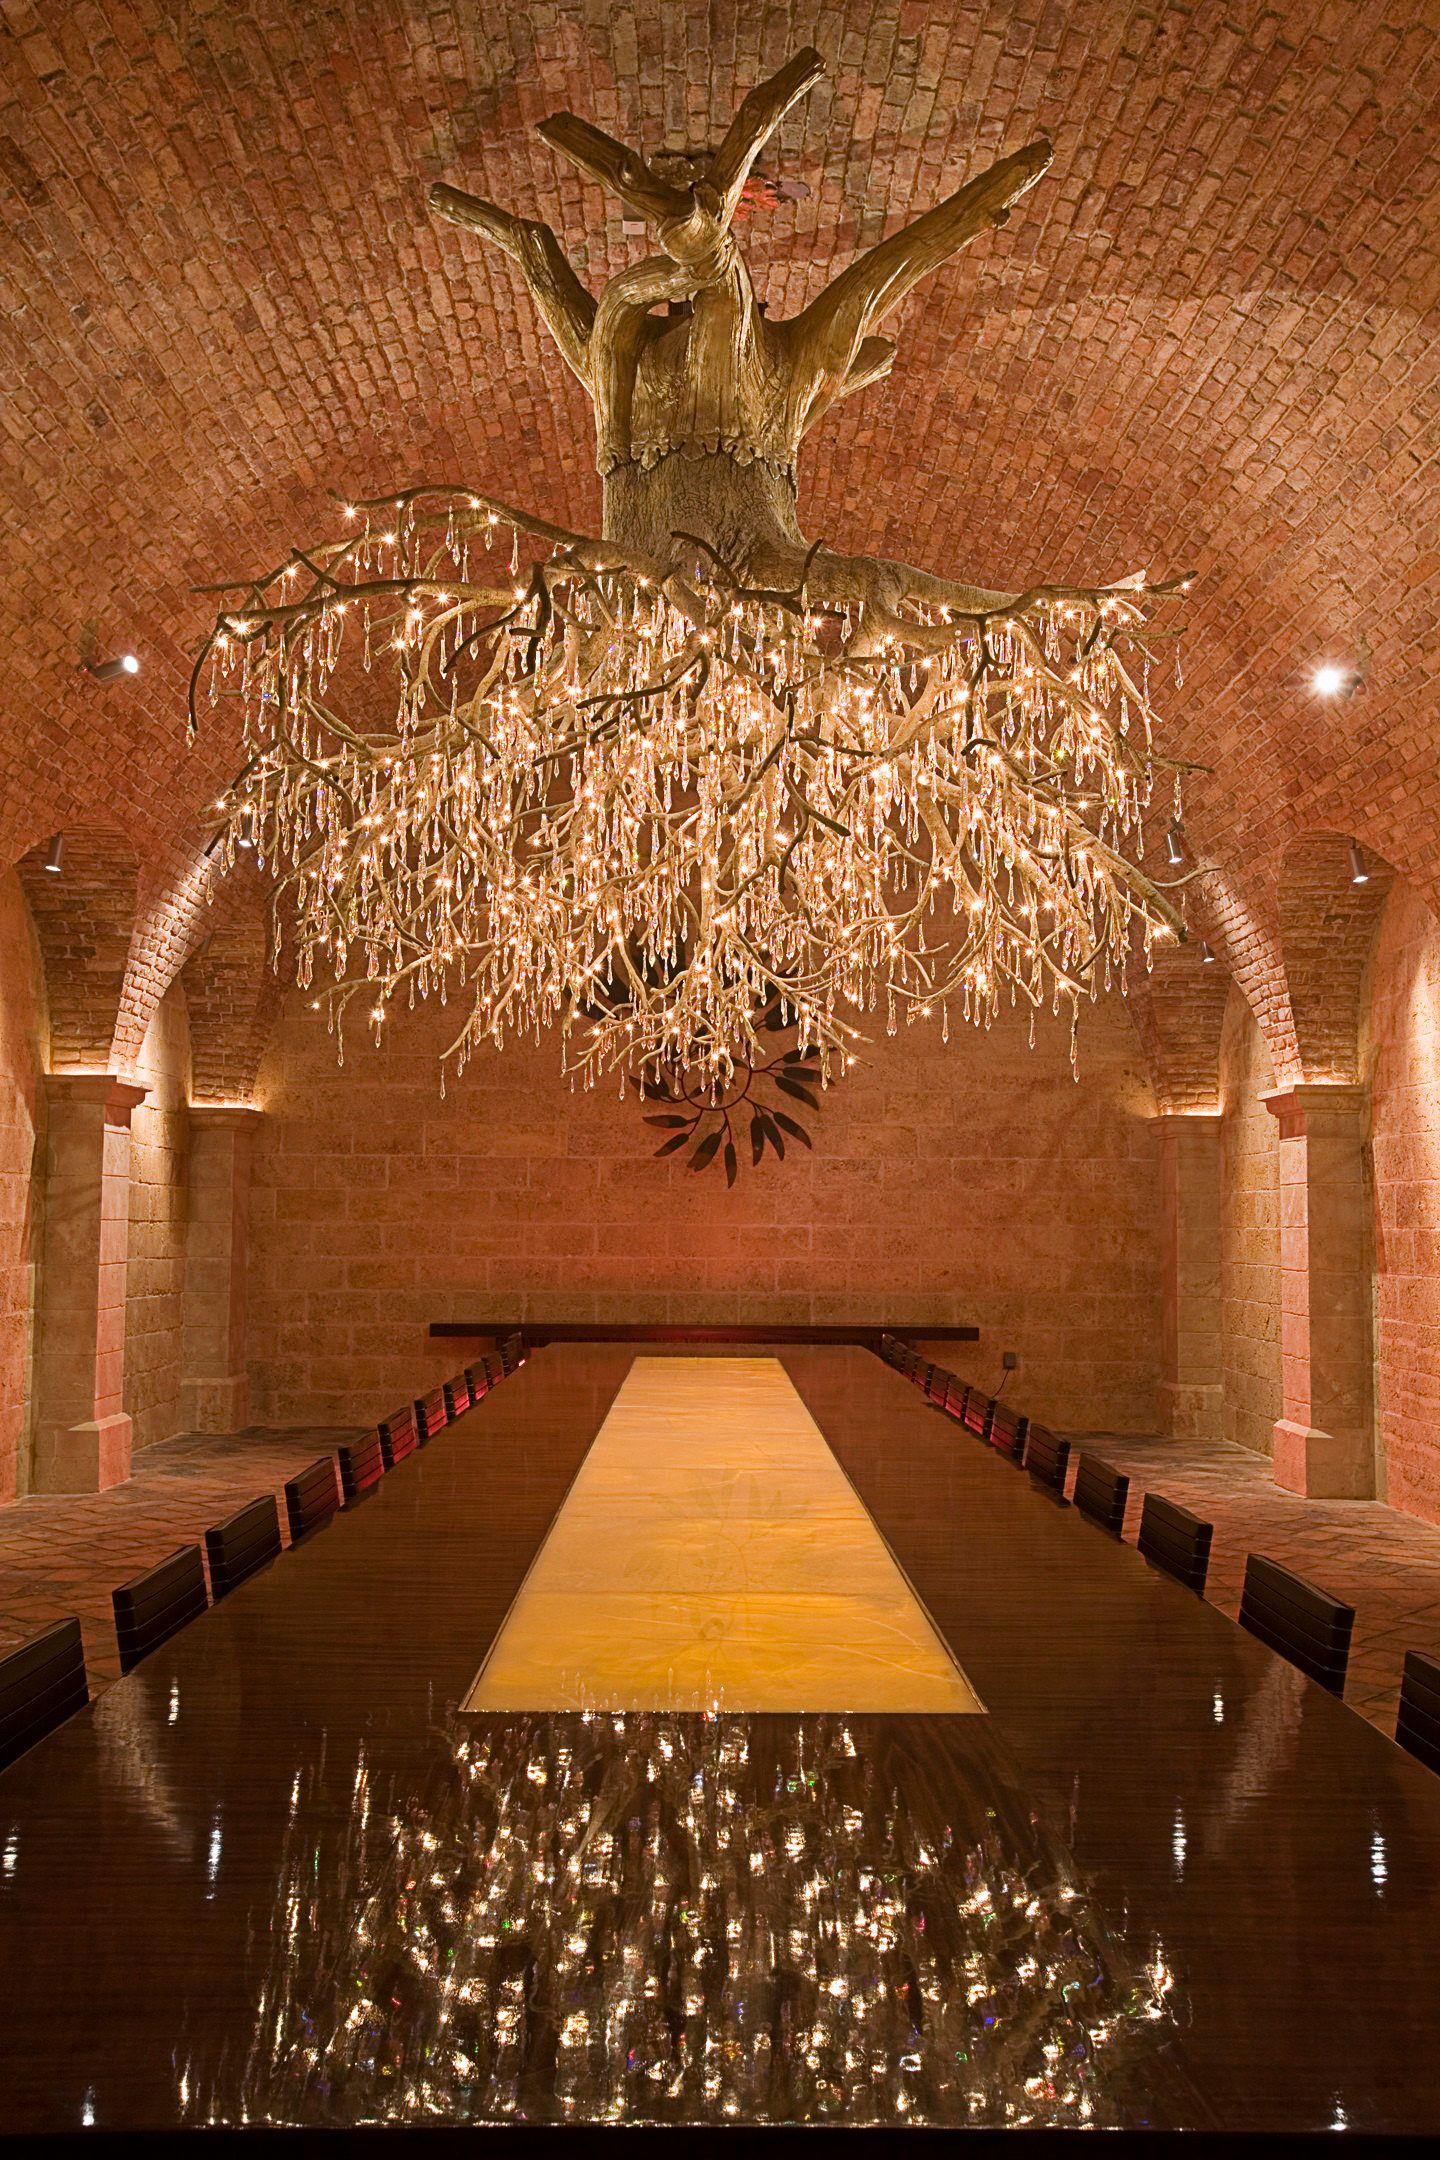 Genial Weinreben Wurzel Als Kronleuchter Fur Weinkeller Kronleuchter Modern Ausgefallene Lampen Kronleuchter Ideen